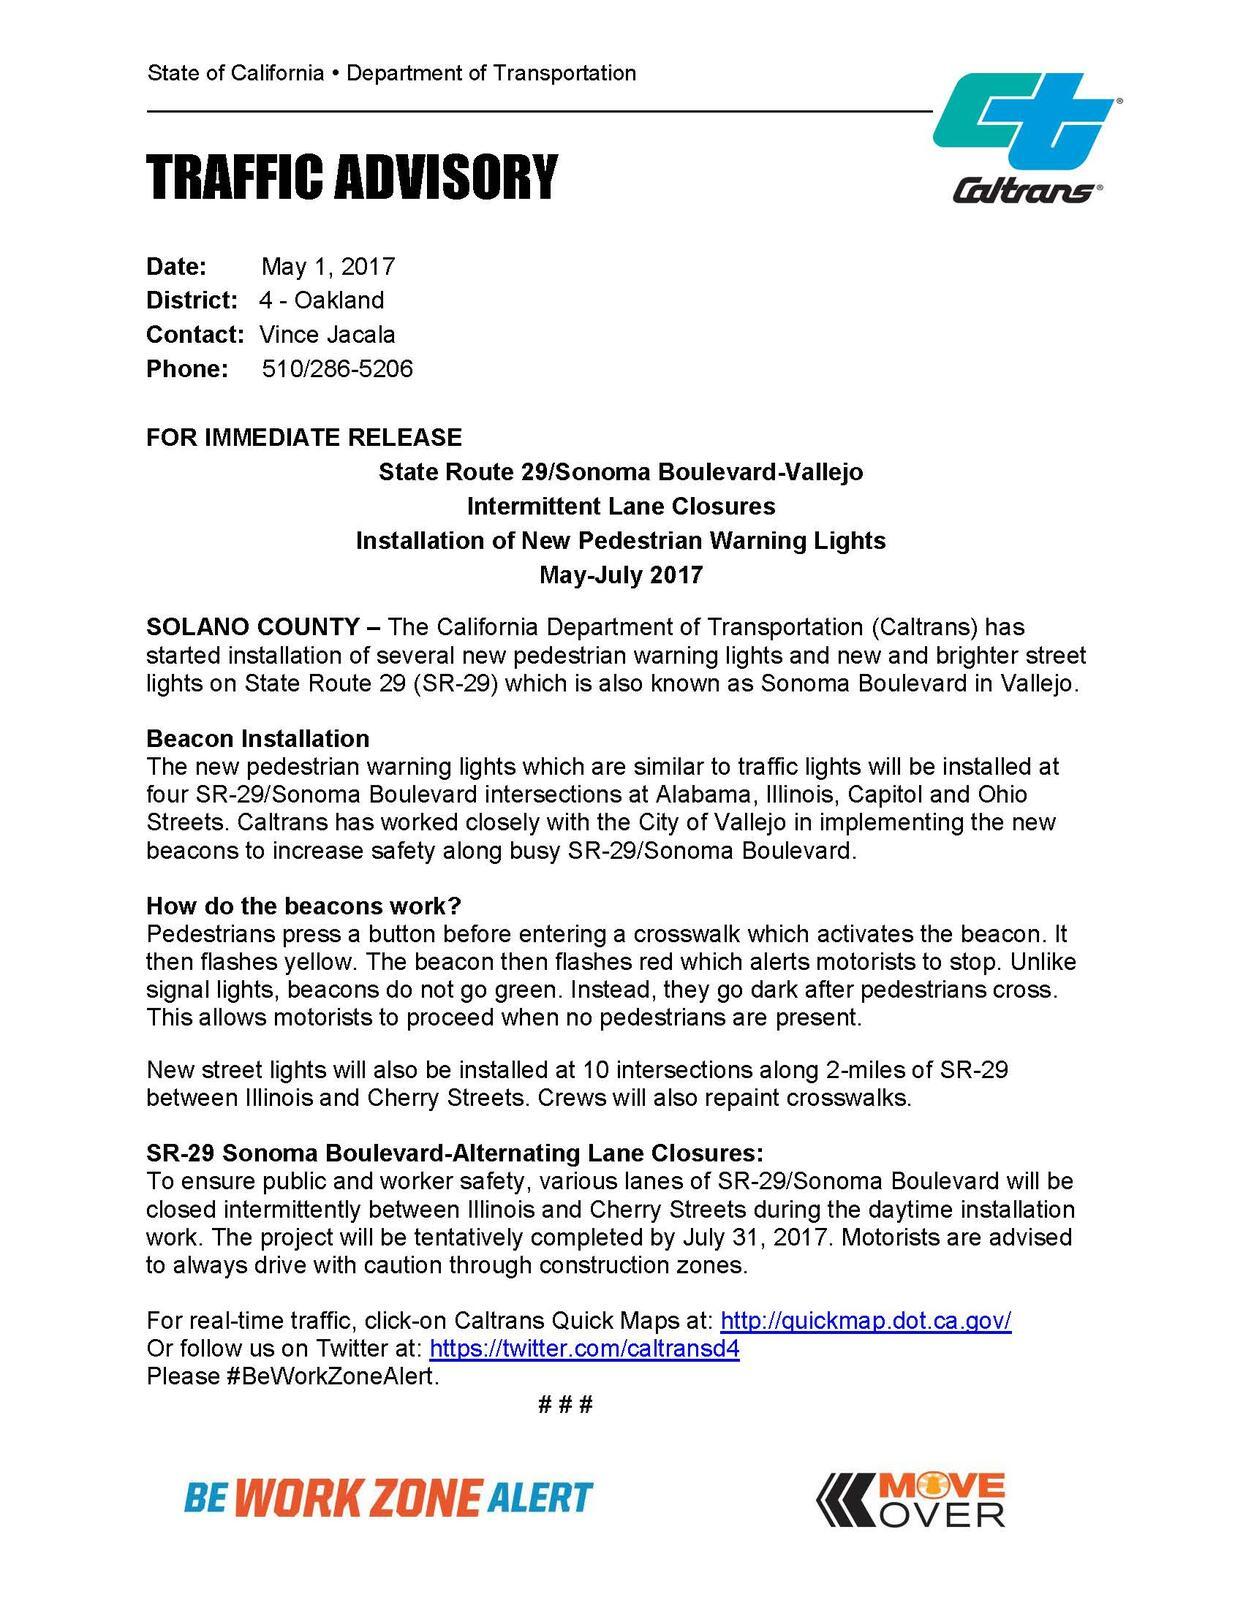 Caltrans Work on Somona Boulevard - Intermittent Lane Closures May on